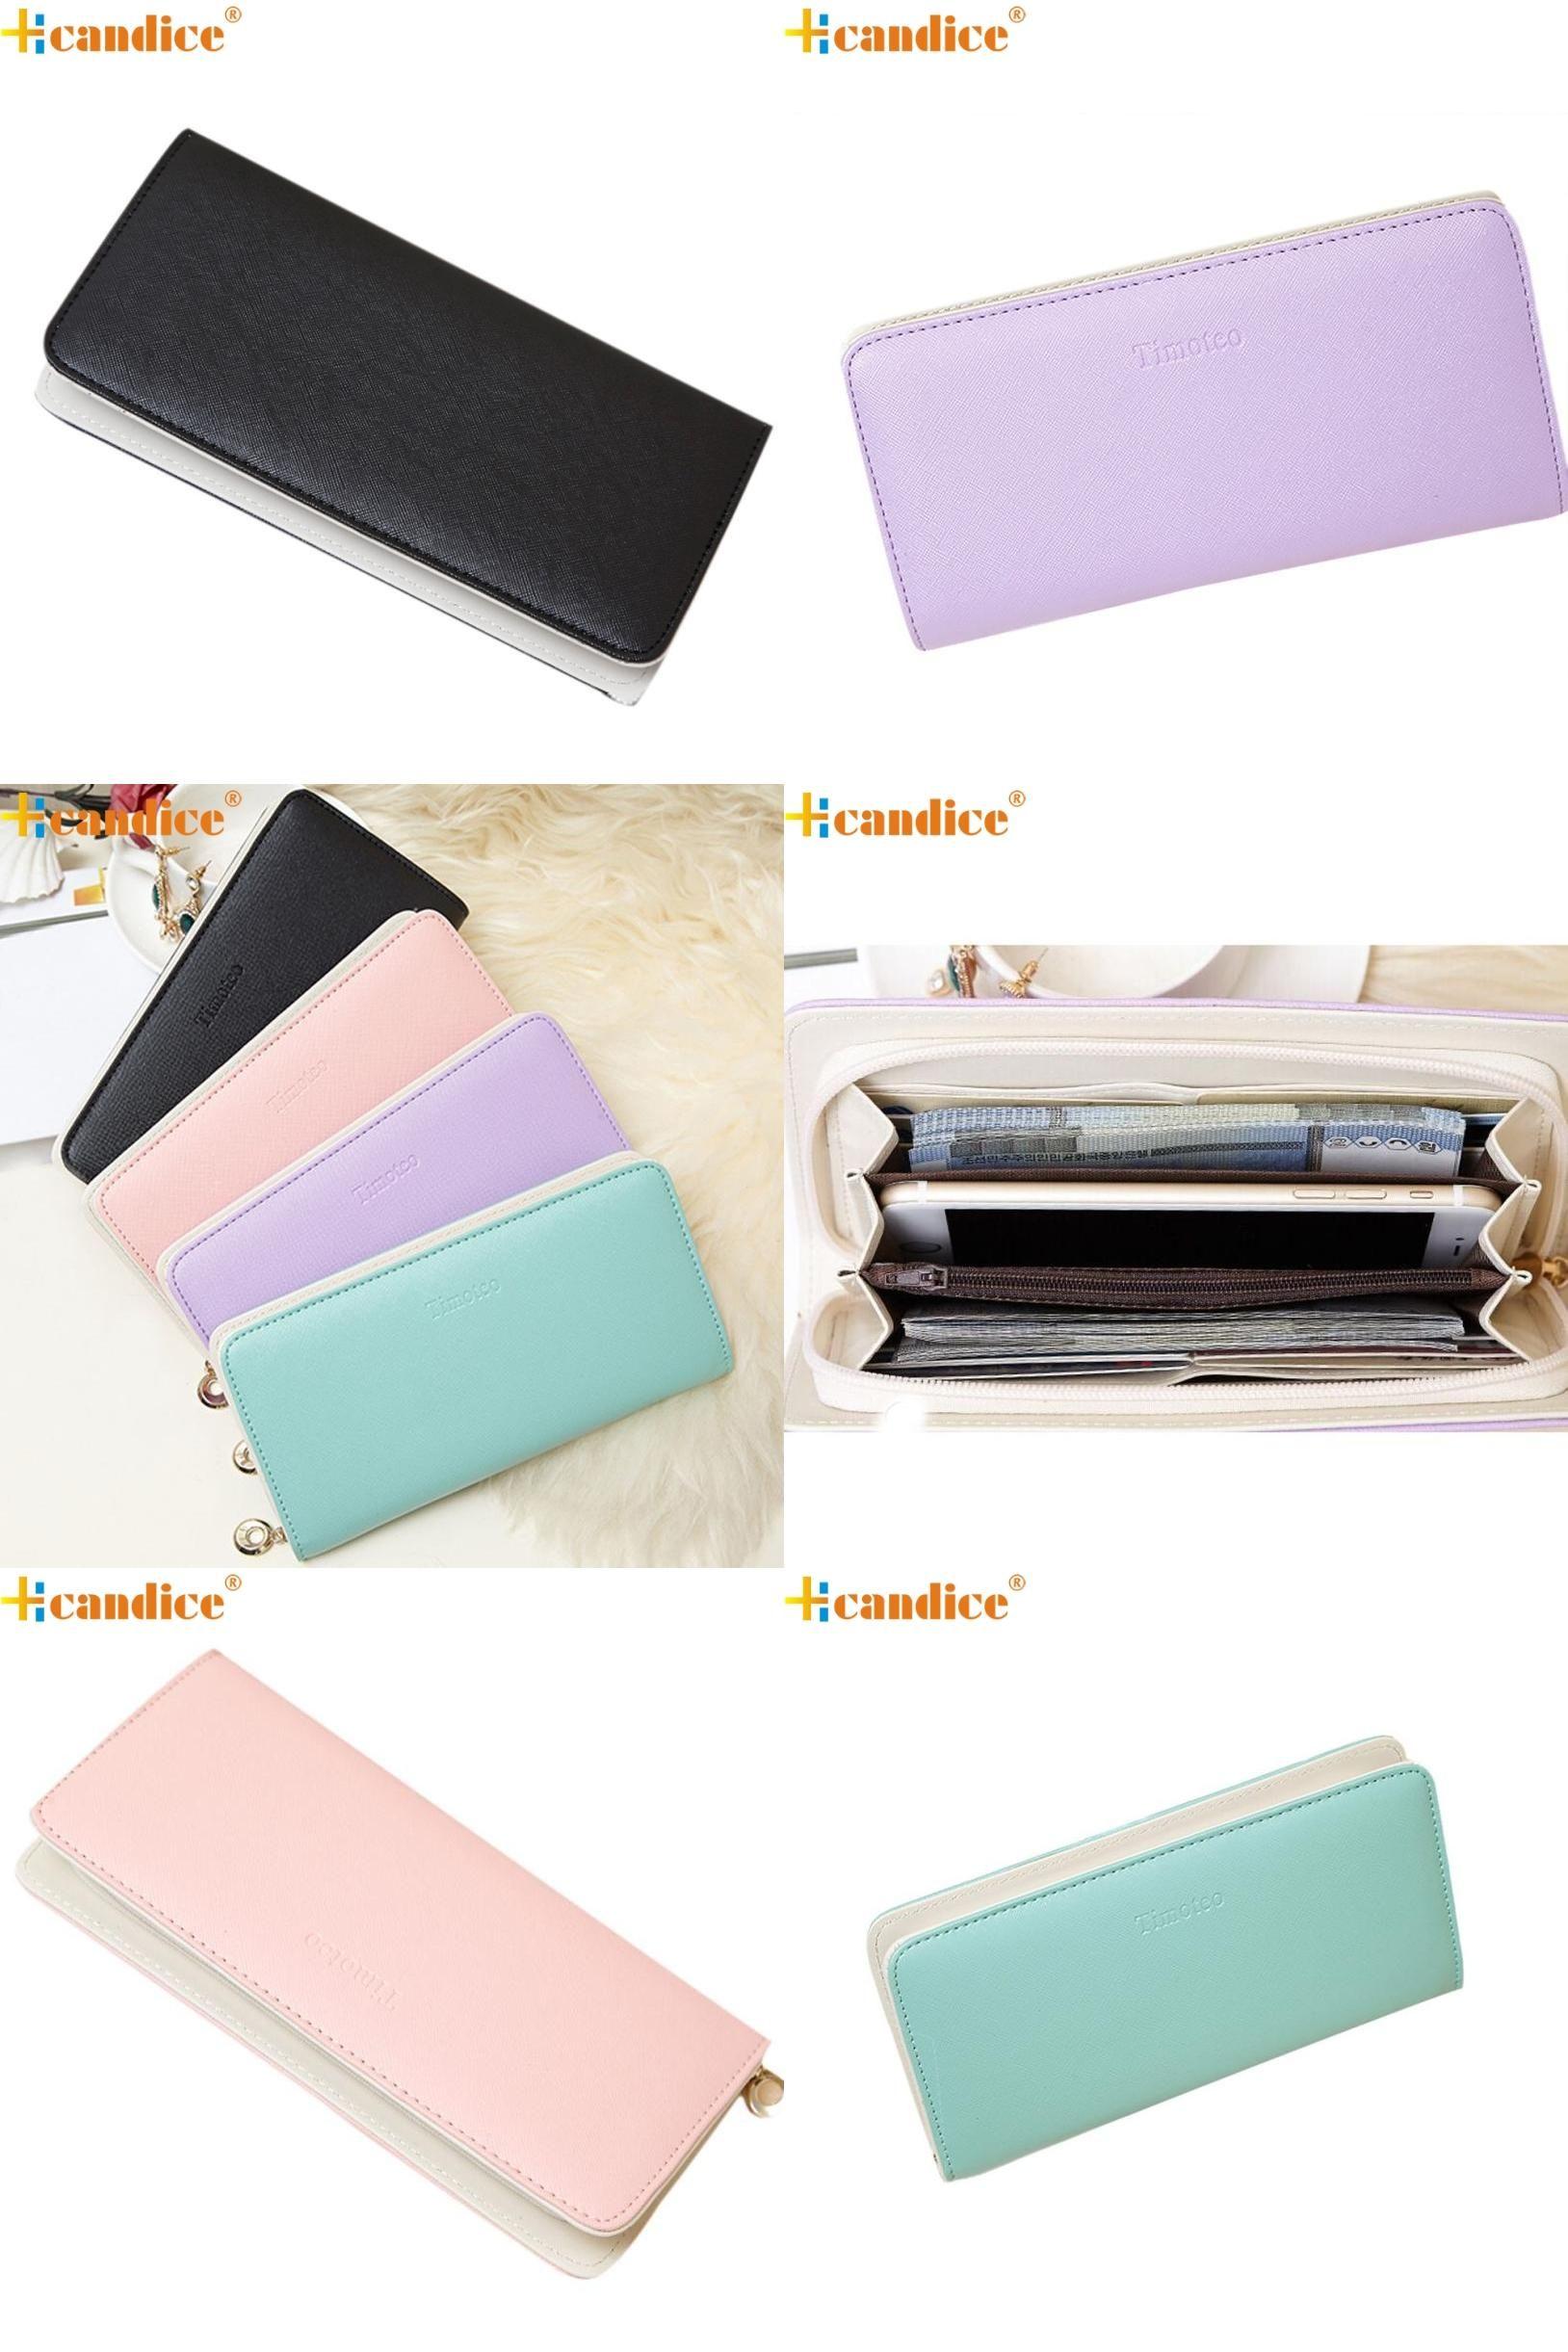 [Visit to Buy] Hcandice Best Gift Wholesale Women Clutch Long Purse Wallet Card Holder Handbag Bag Jan19 #Advertisement